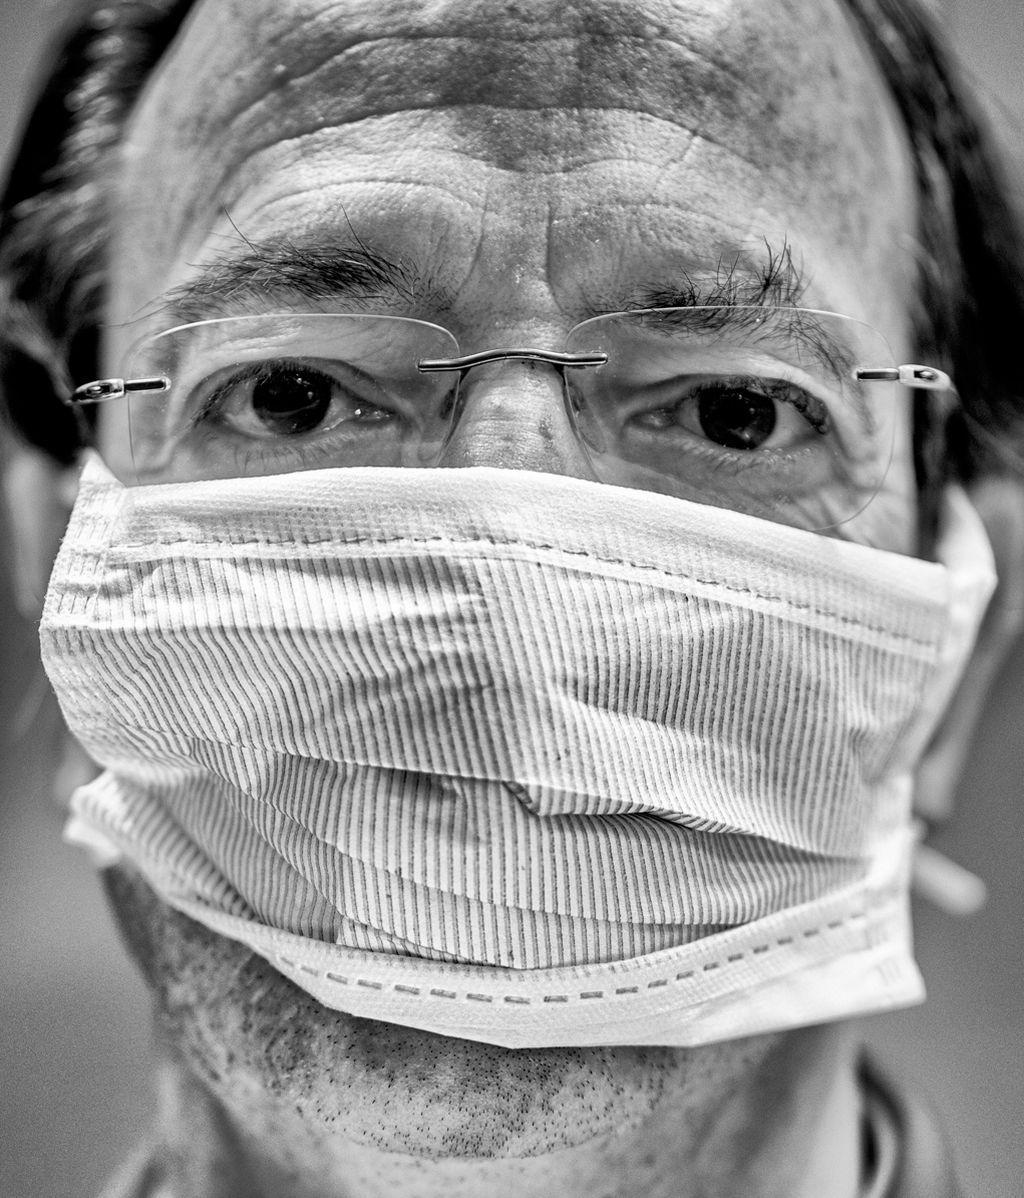 Manolo Barroso (60), carnicero